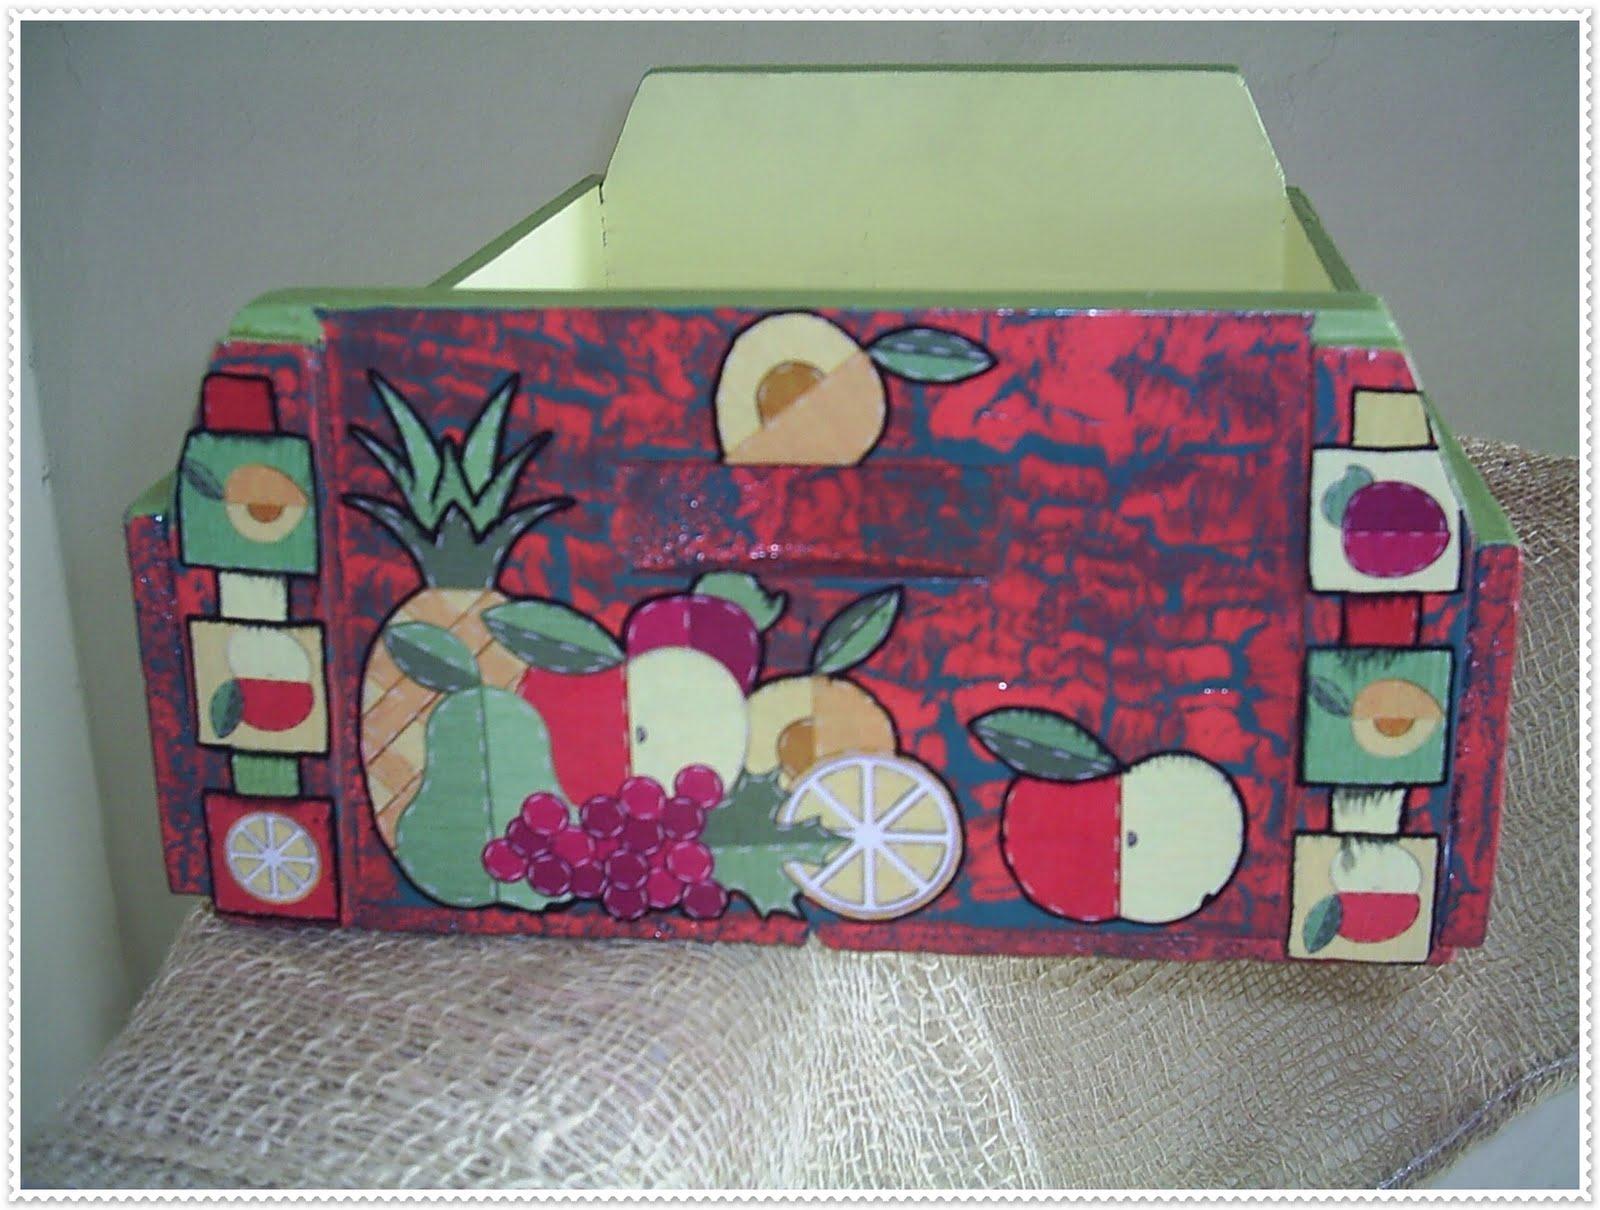 Artesanato e Presentes Anita: Fruteira Rustica Caixa de frutas #9E2D42 1600x1210